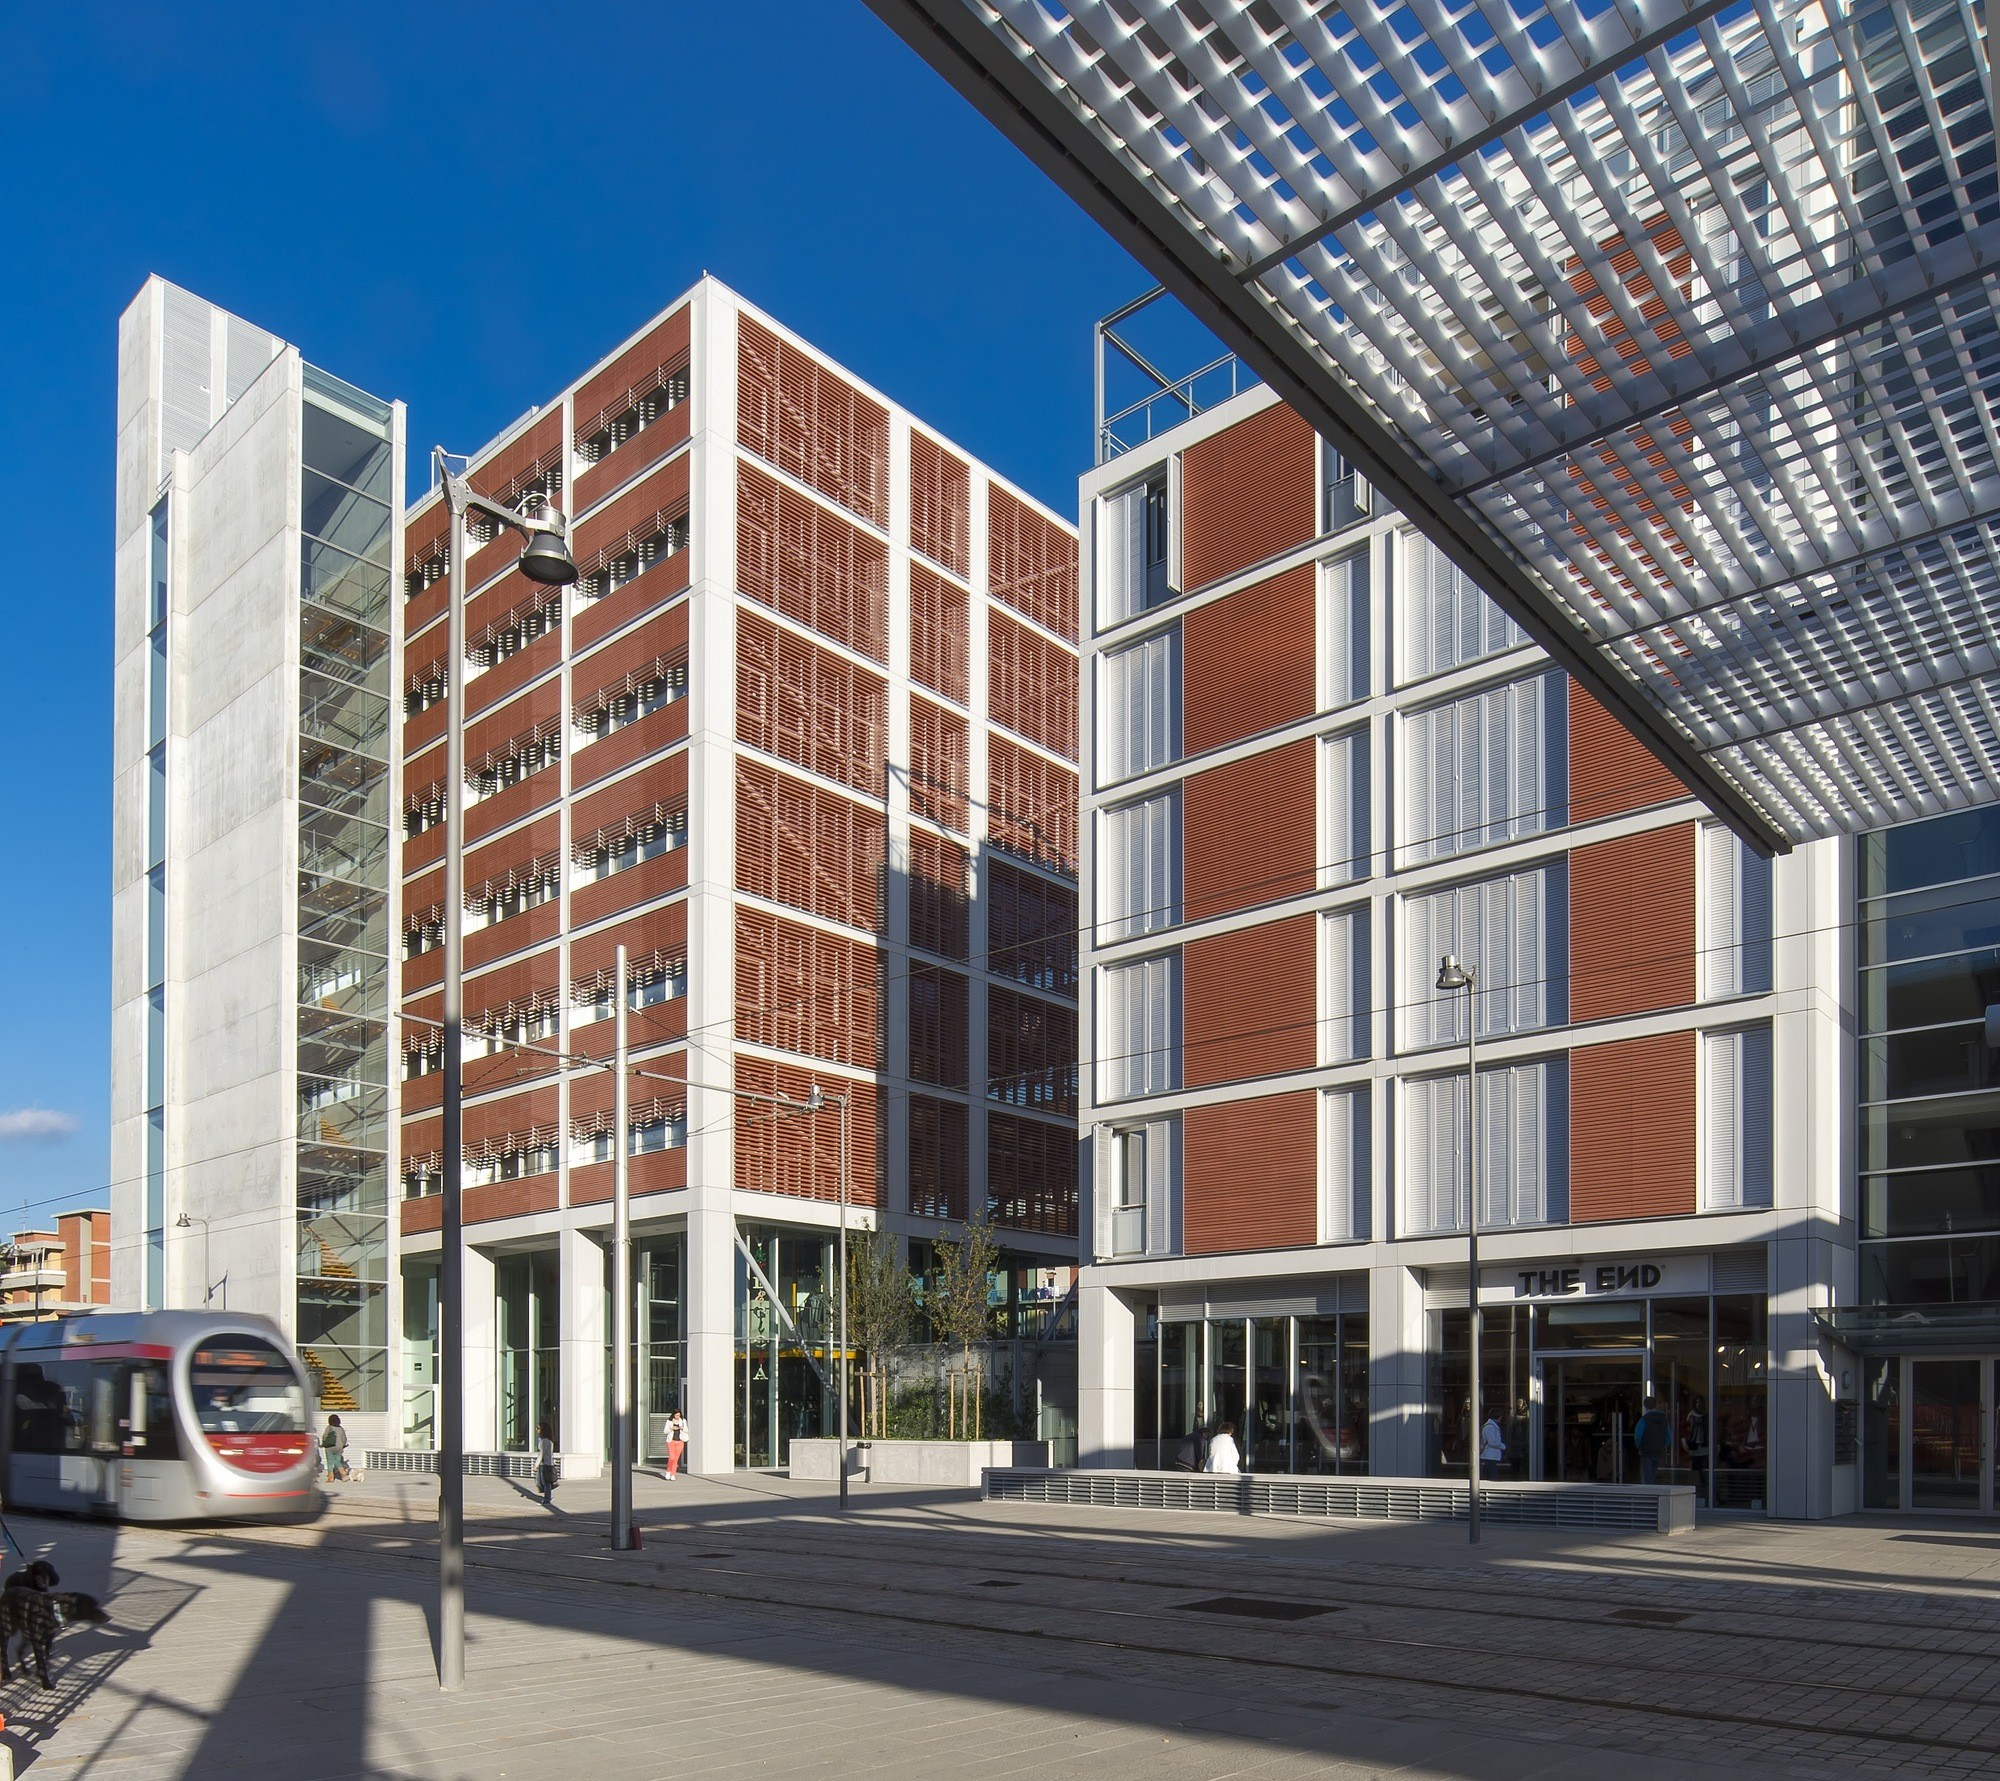 Nuevo Centro Civico en Scandicci / Rogers Stirk Harbour + Partners. Imágen © Alessandro Ciampi